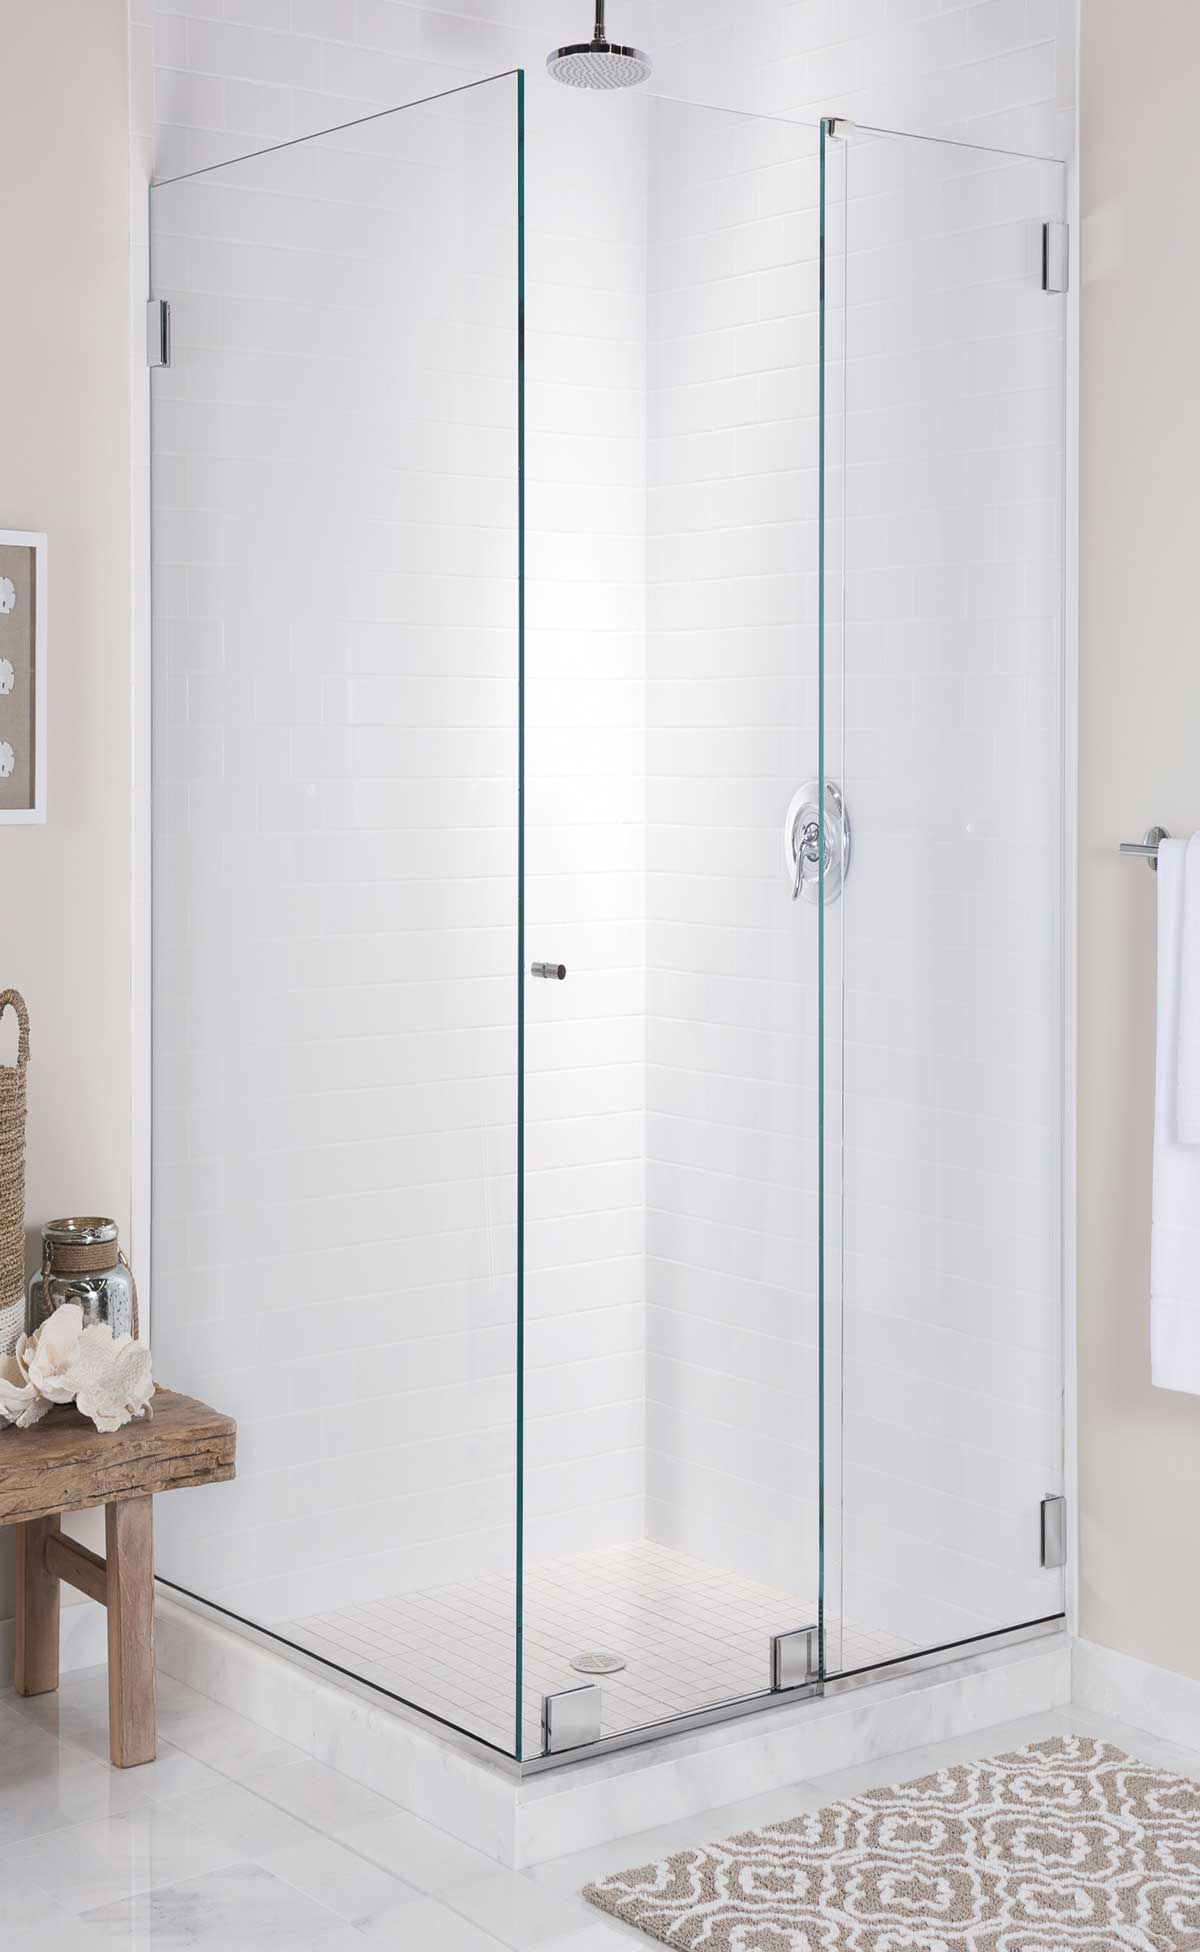 Vanquet 90 Frameless Sliding Enclosure Mr Shower Door